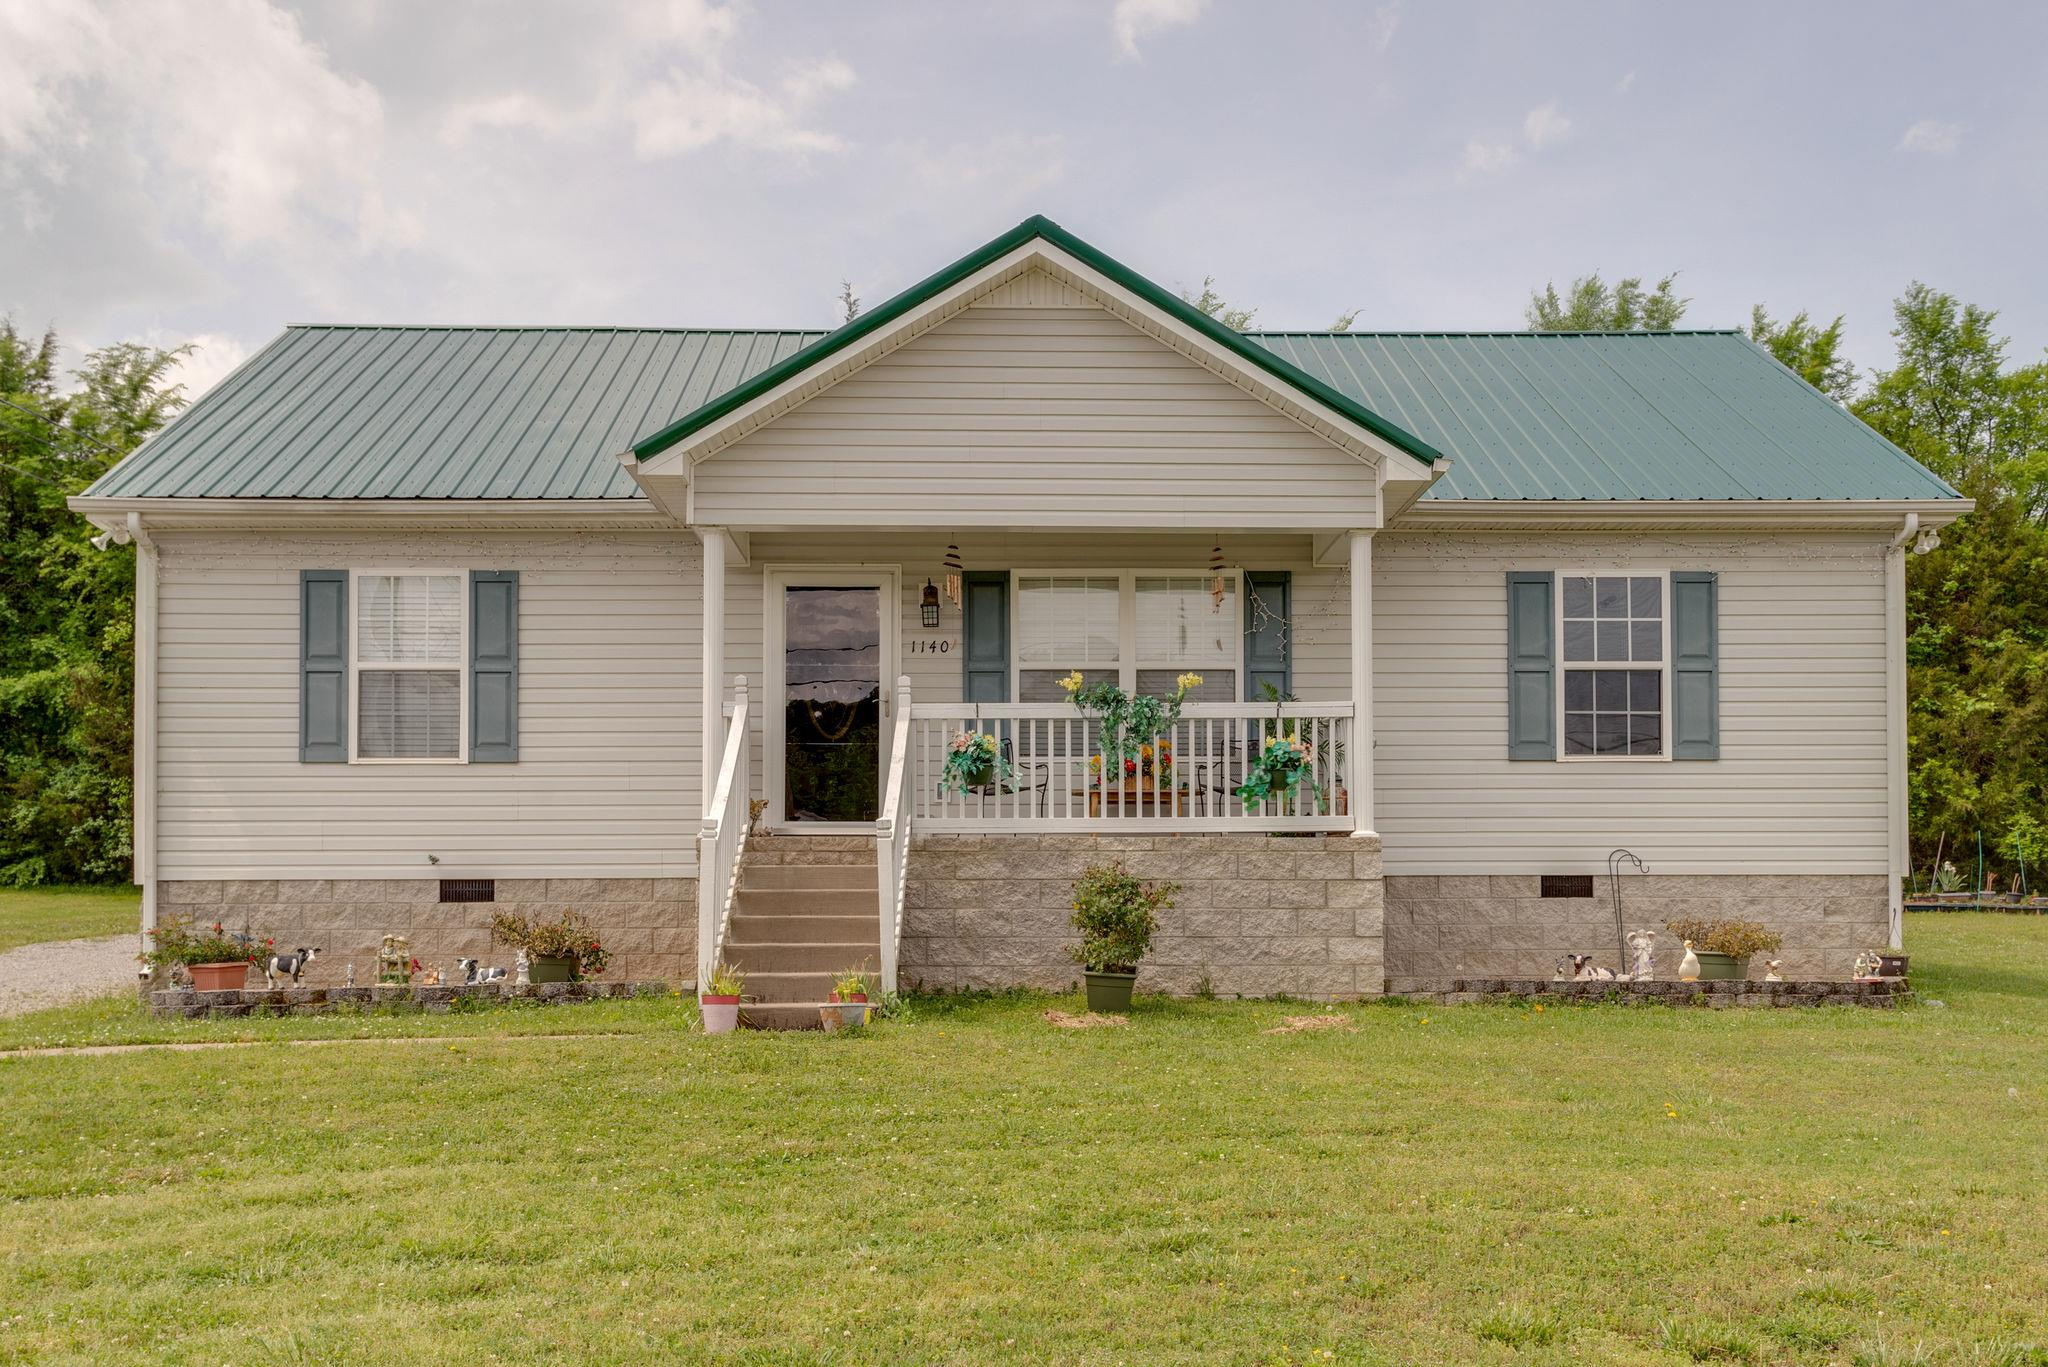 1140 Moreno Ln, Lewisburg, TN 37091 - Lewisburg, TN real estate listing